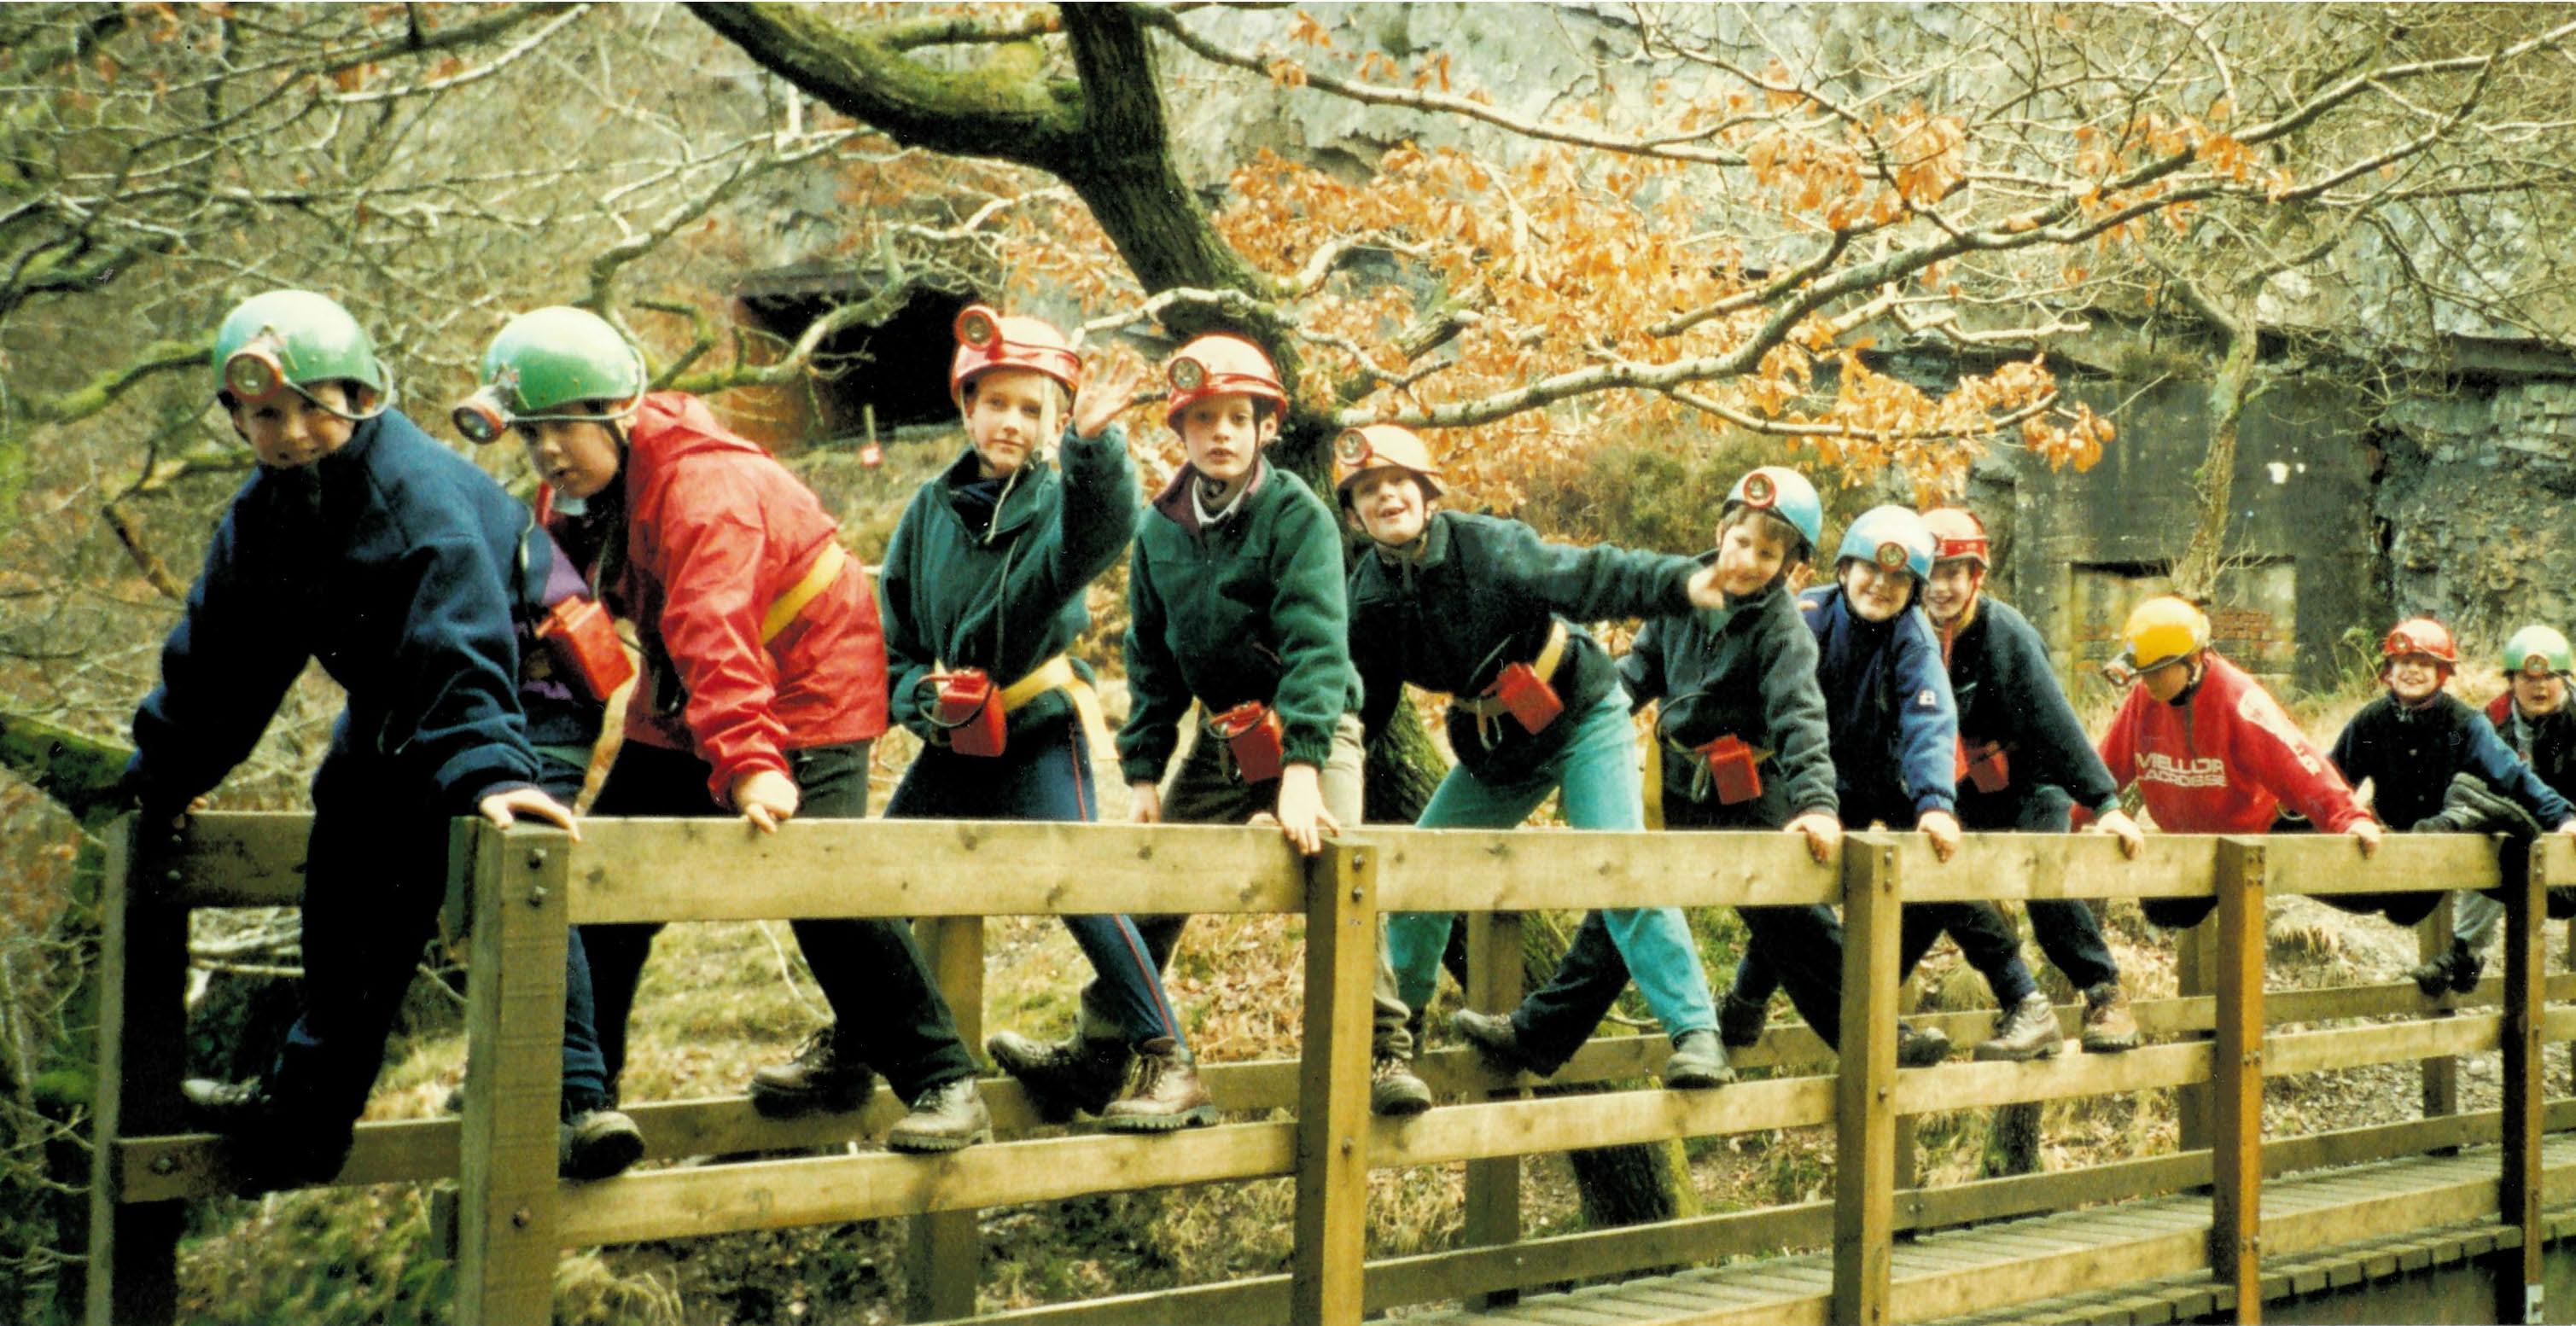 School Course Gorge Event